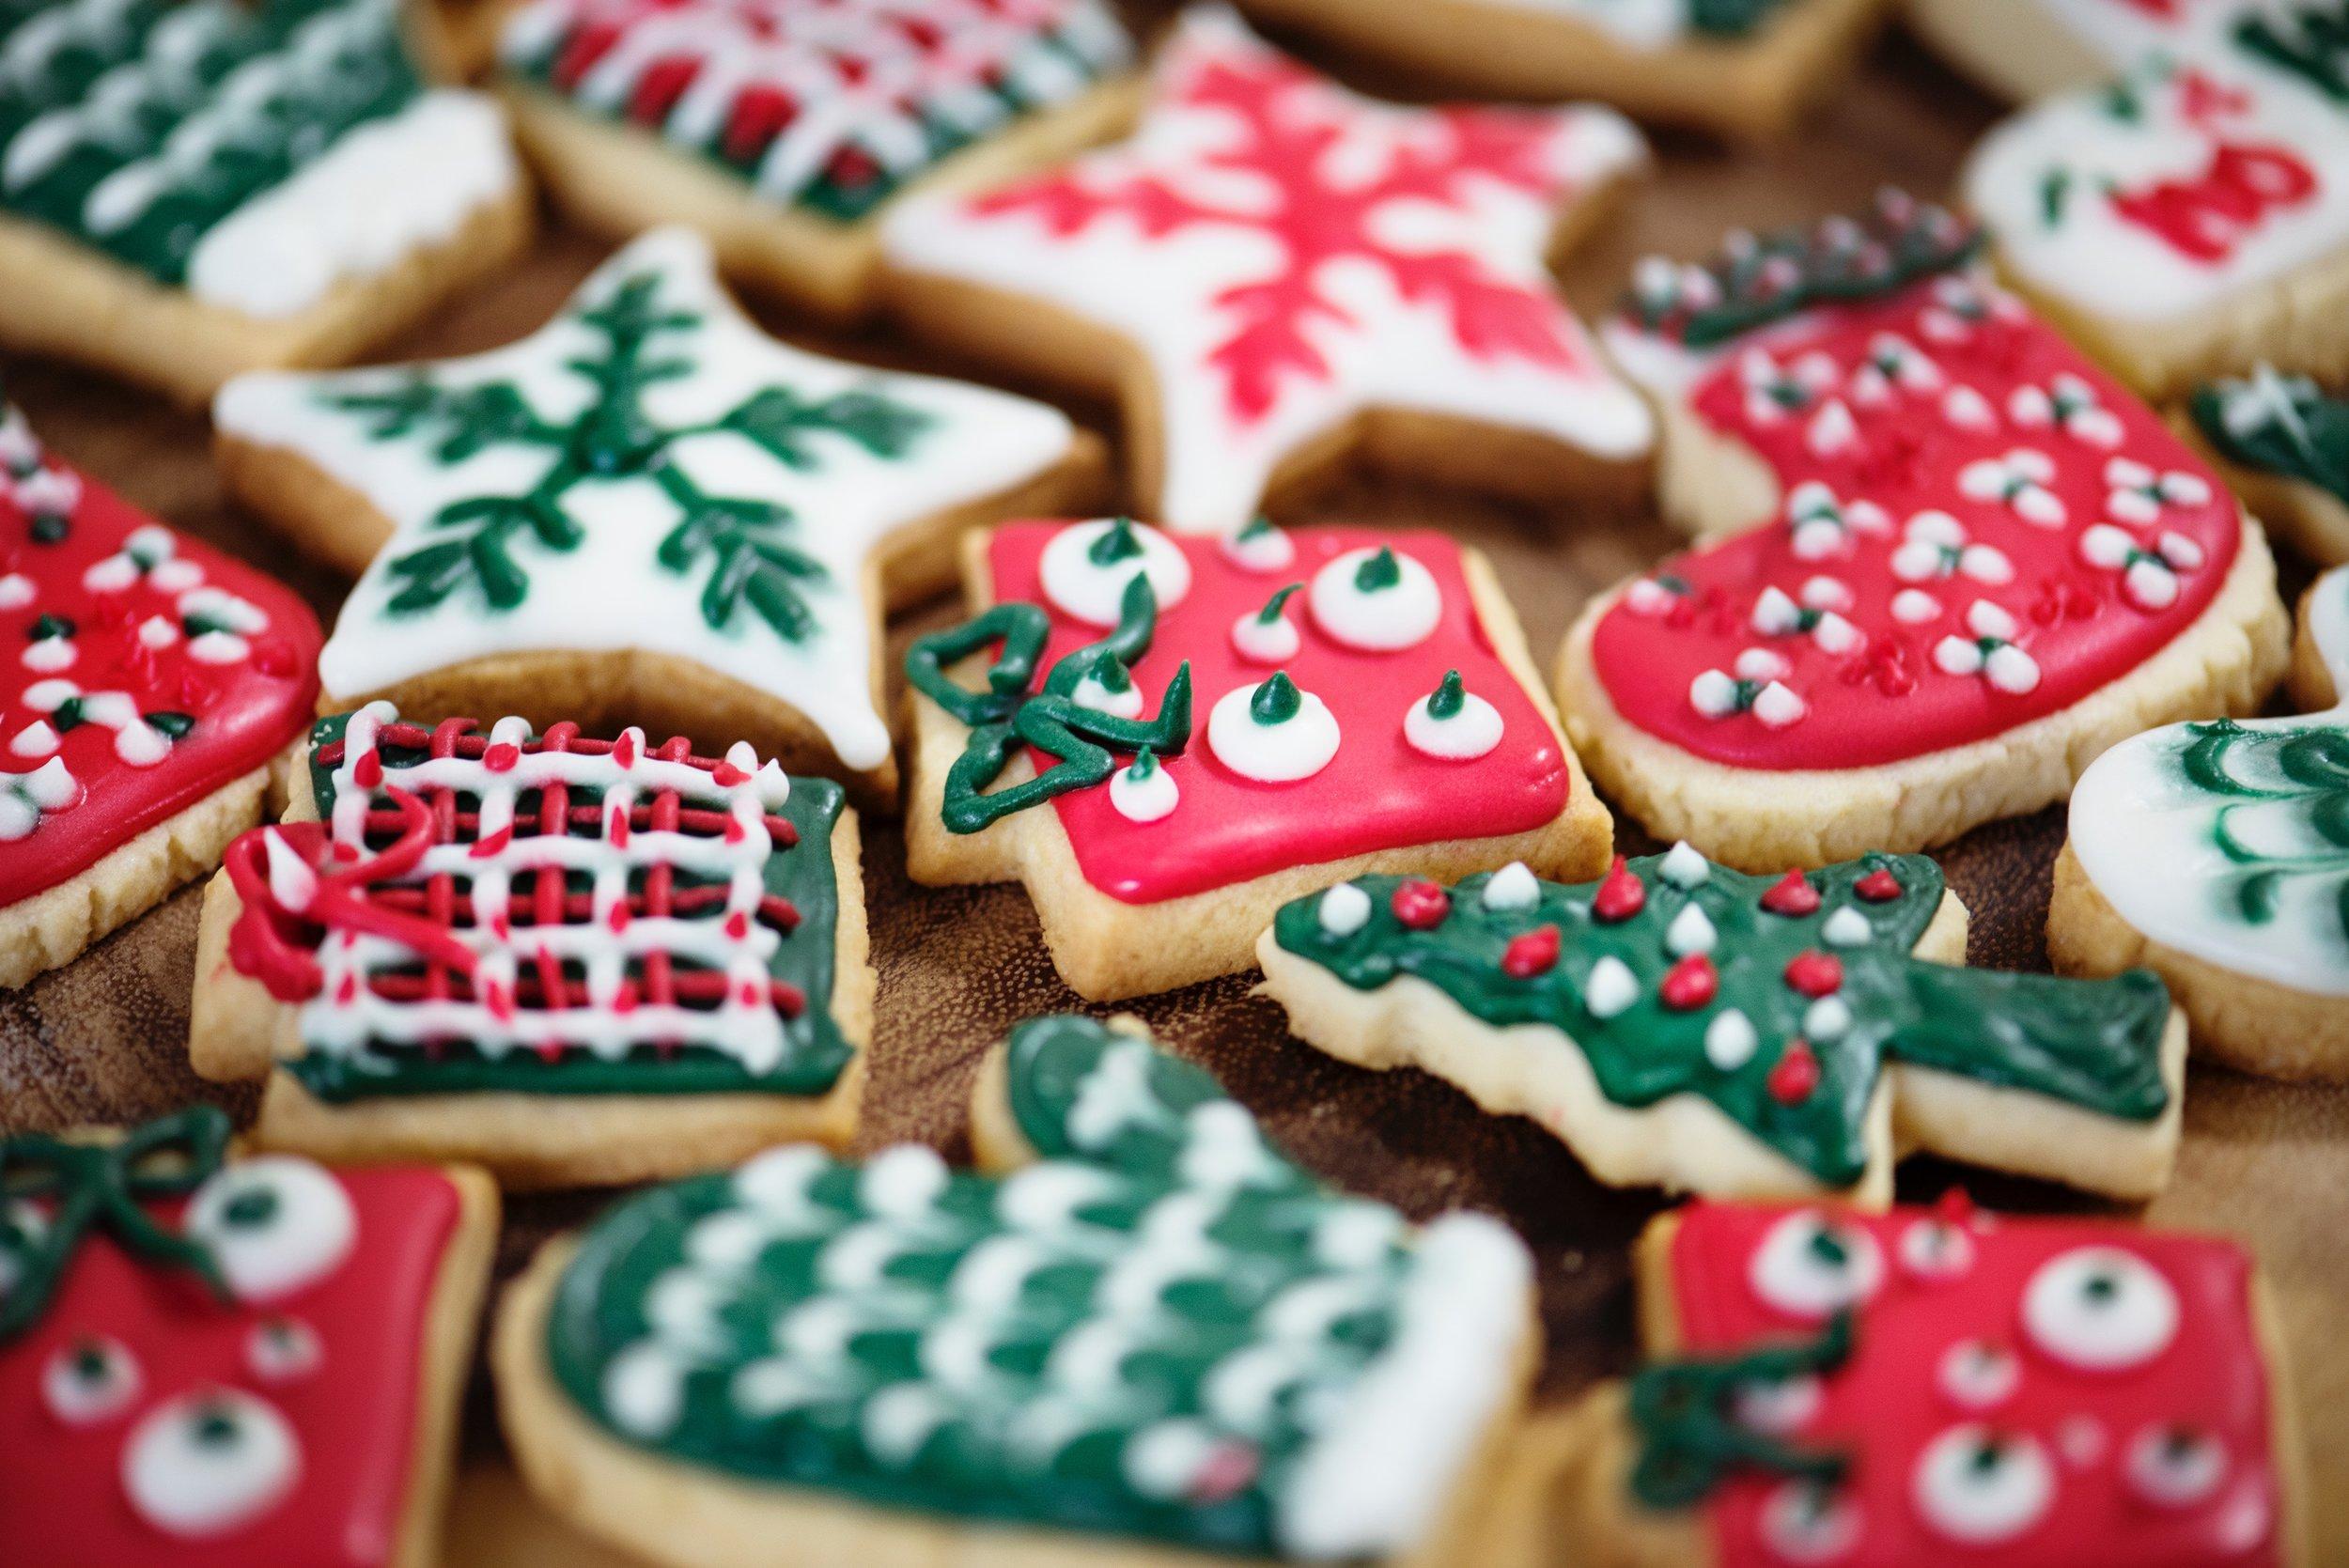 baked-blur-christmas-688010.jpg